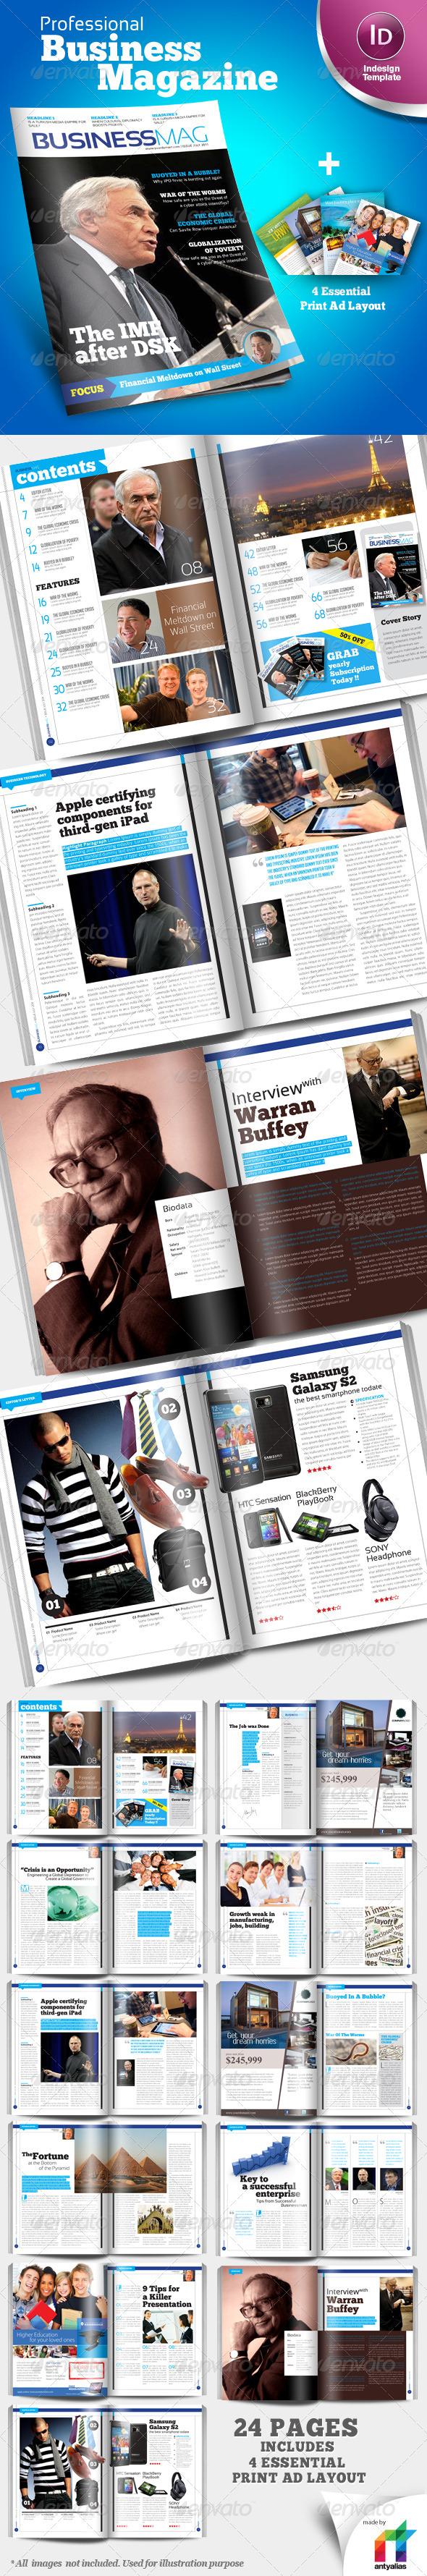 Profesional business magazine indesign template magazine world profesional business magazine indesign template friedricerecipe Images